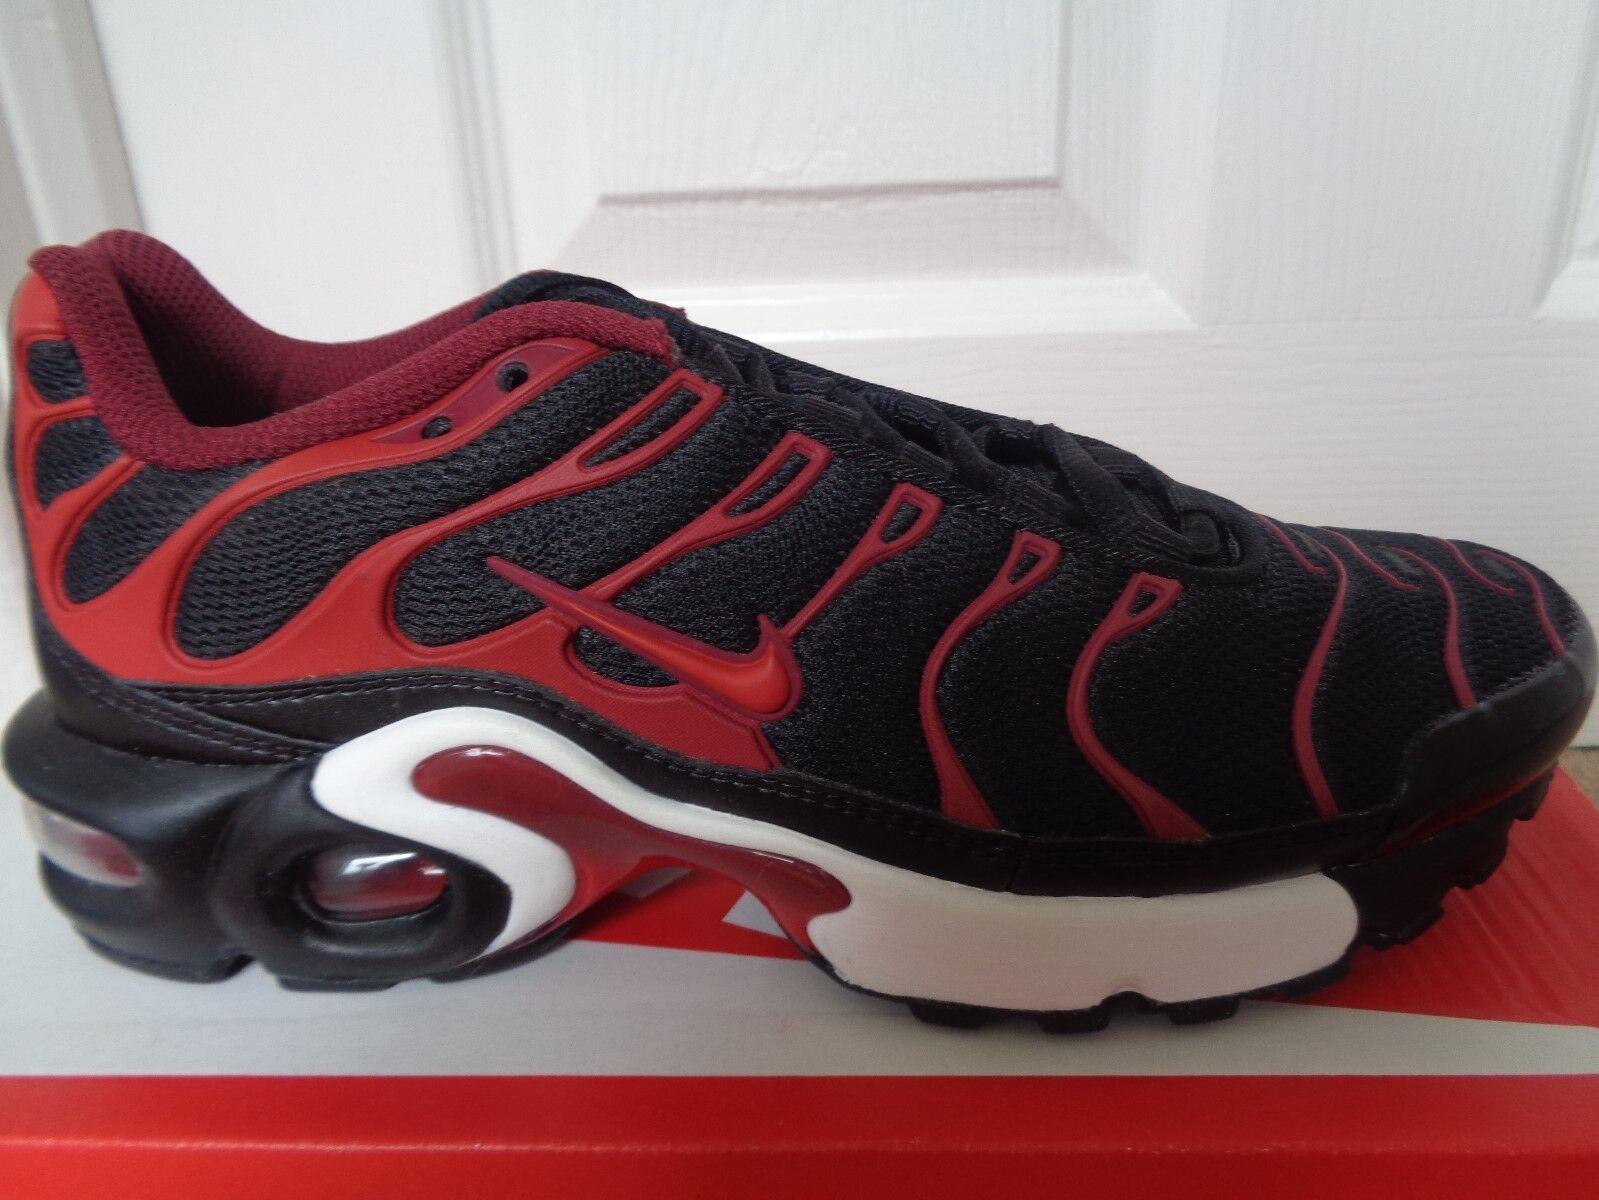 27b13bdfdd Original Womens Girls Nike Air Max TN Plus Tuned 1 Black Pink ...